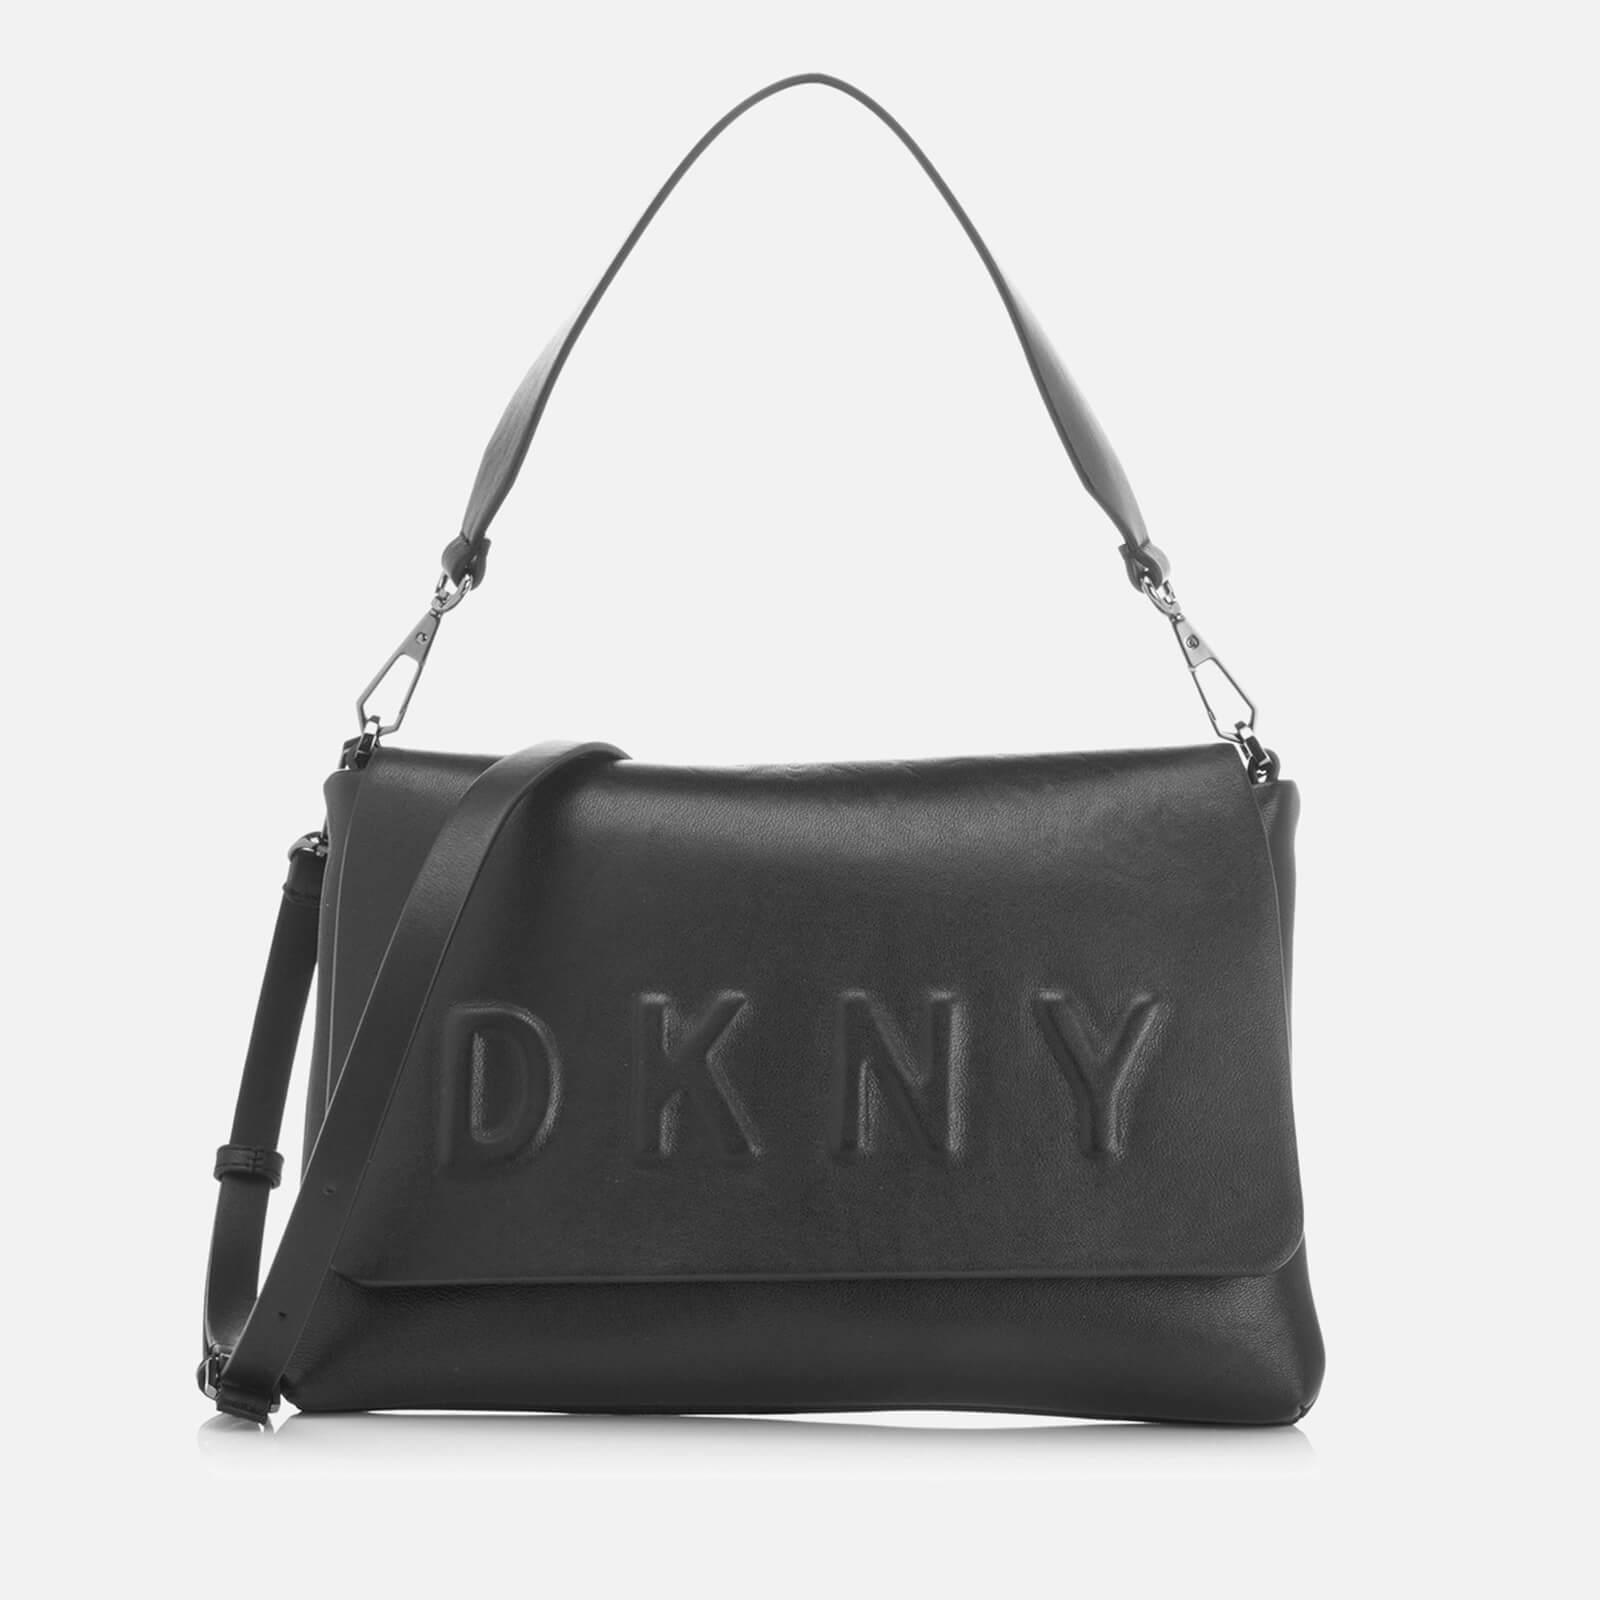 DKNY Women's Flap Shoulder Bag Black